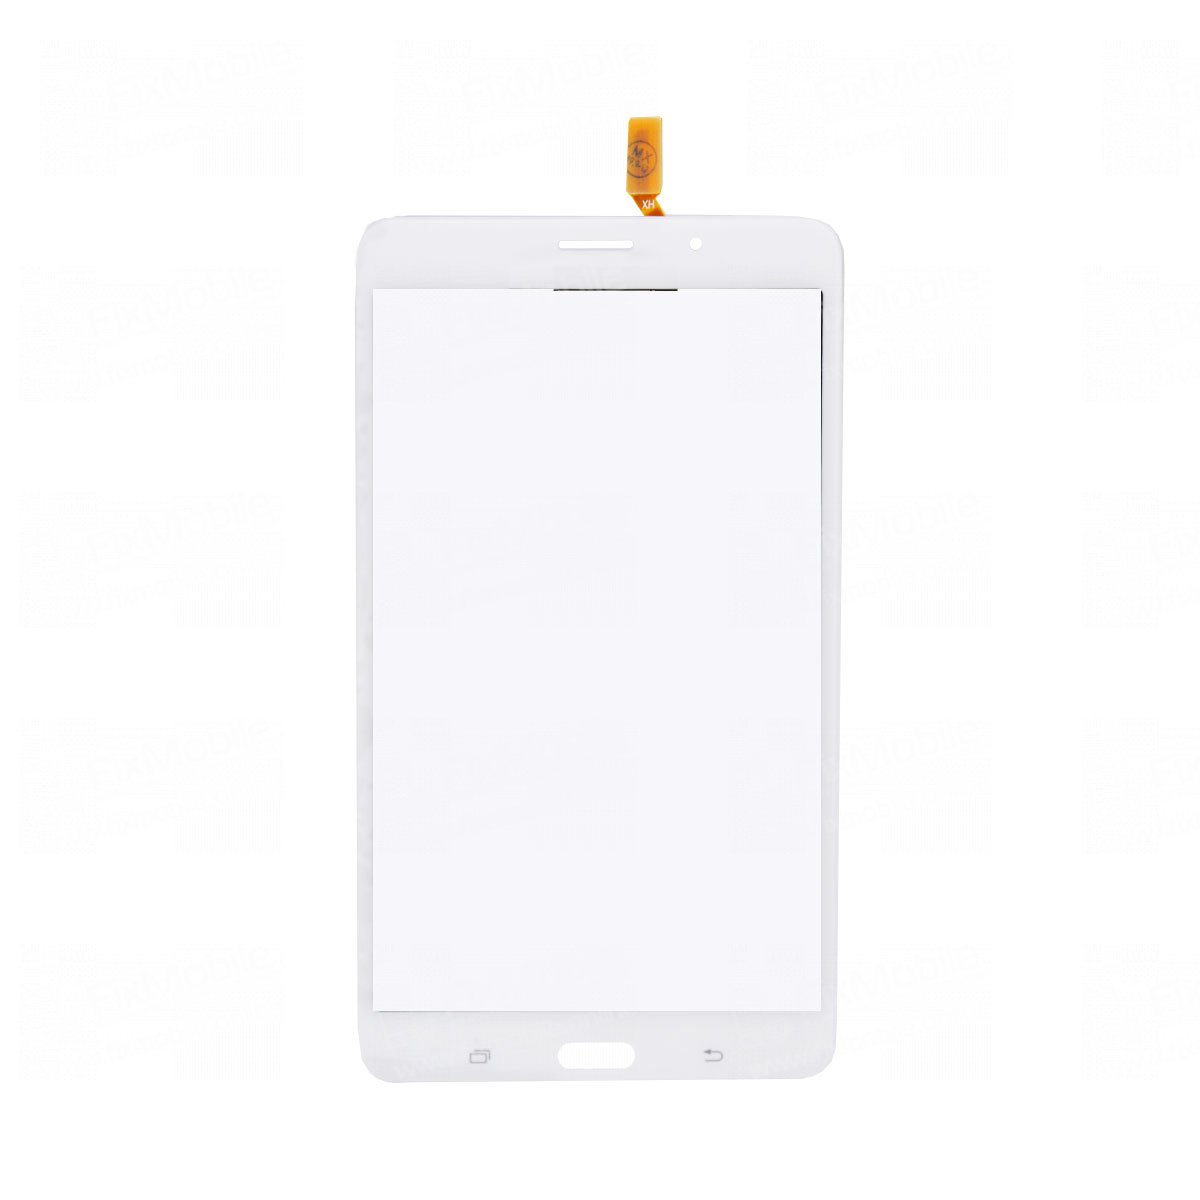 Тачскрин (сенсор) для Samsung Galaxy Tab 4 7.0 3G (T231) (белый)